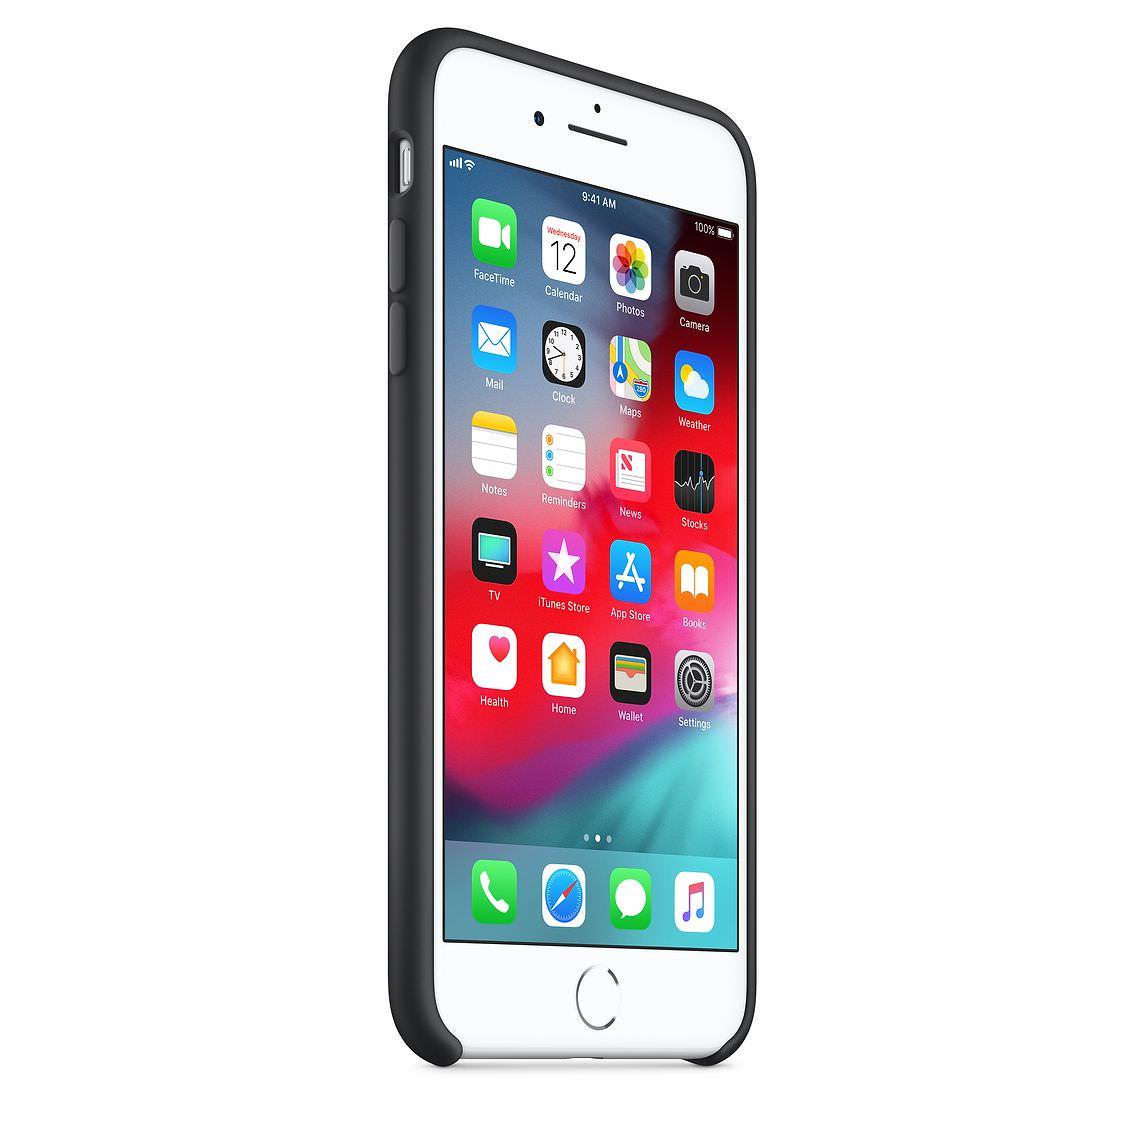 Apple silikónový obal pre iPhone 7 Plus / 8 Plus - čierny 2